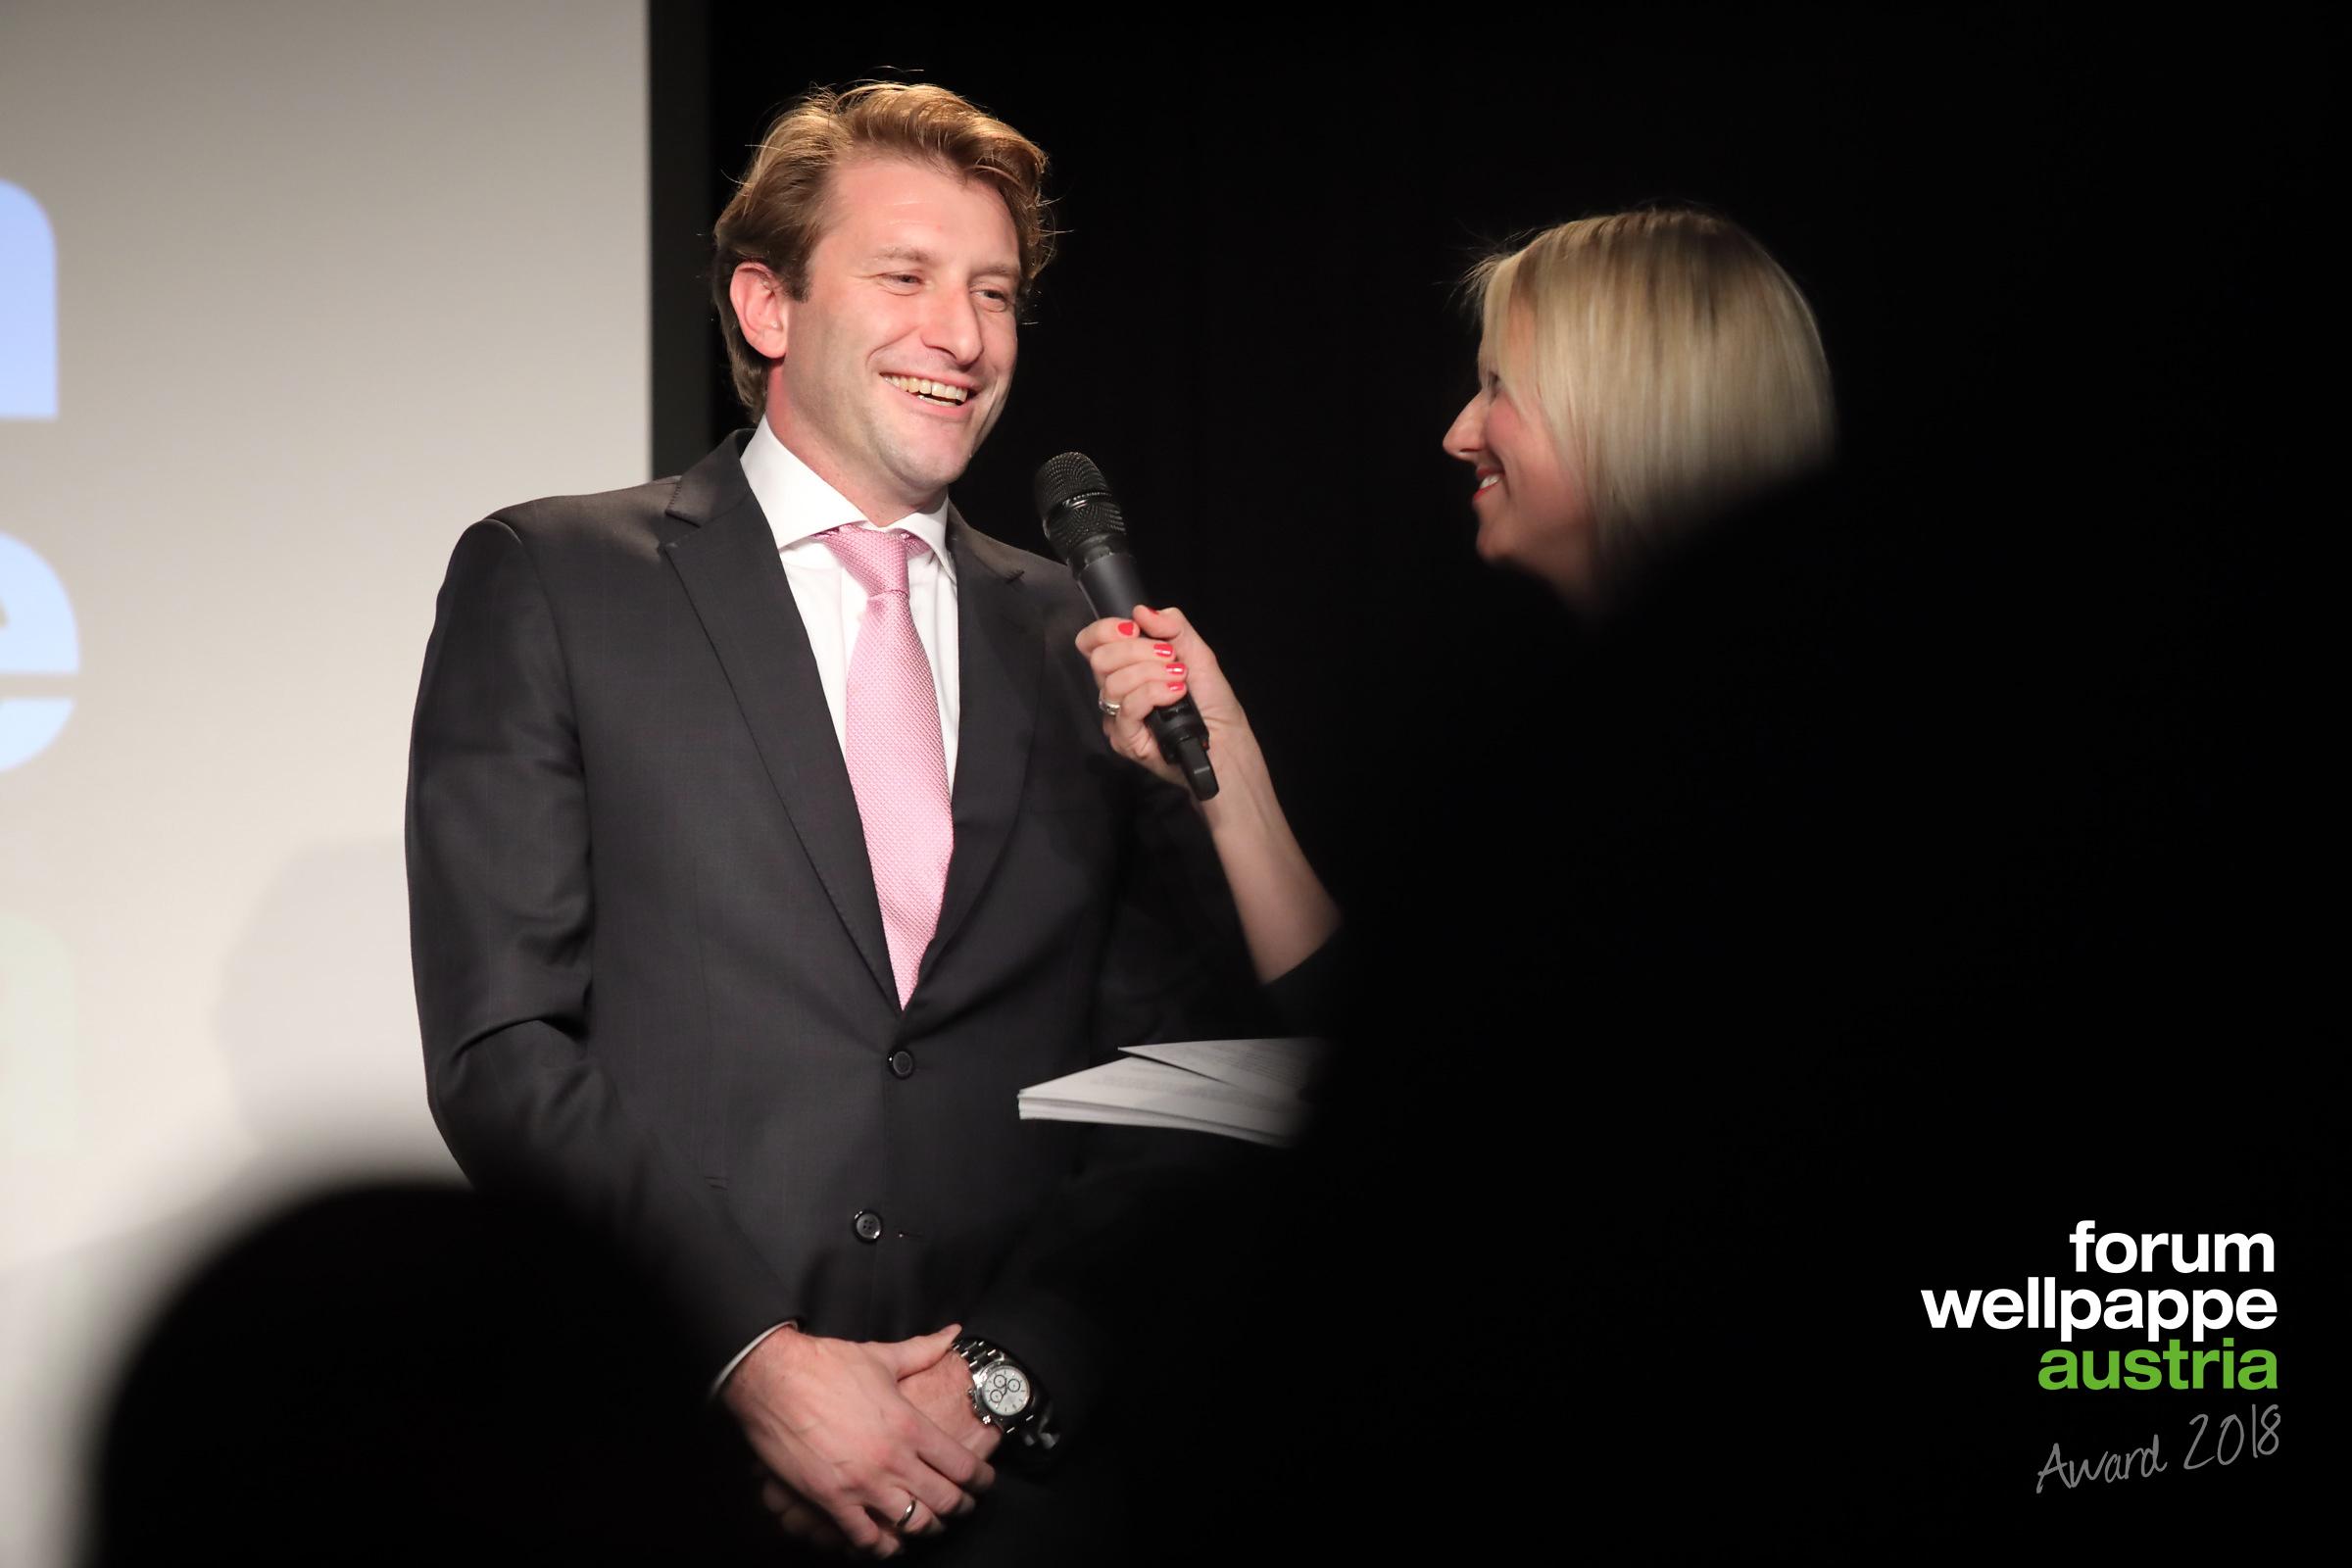 Max Hölbl, Forum Wellpappe Austria, mit der Moderatorin Daniela Soykan © com_unit | Schedl